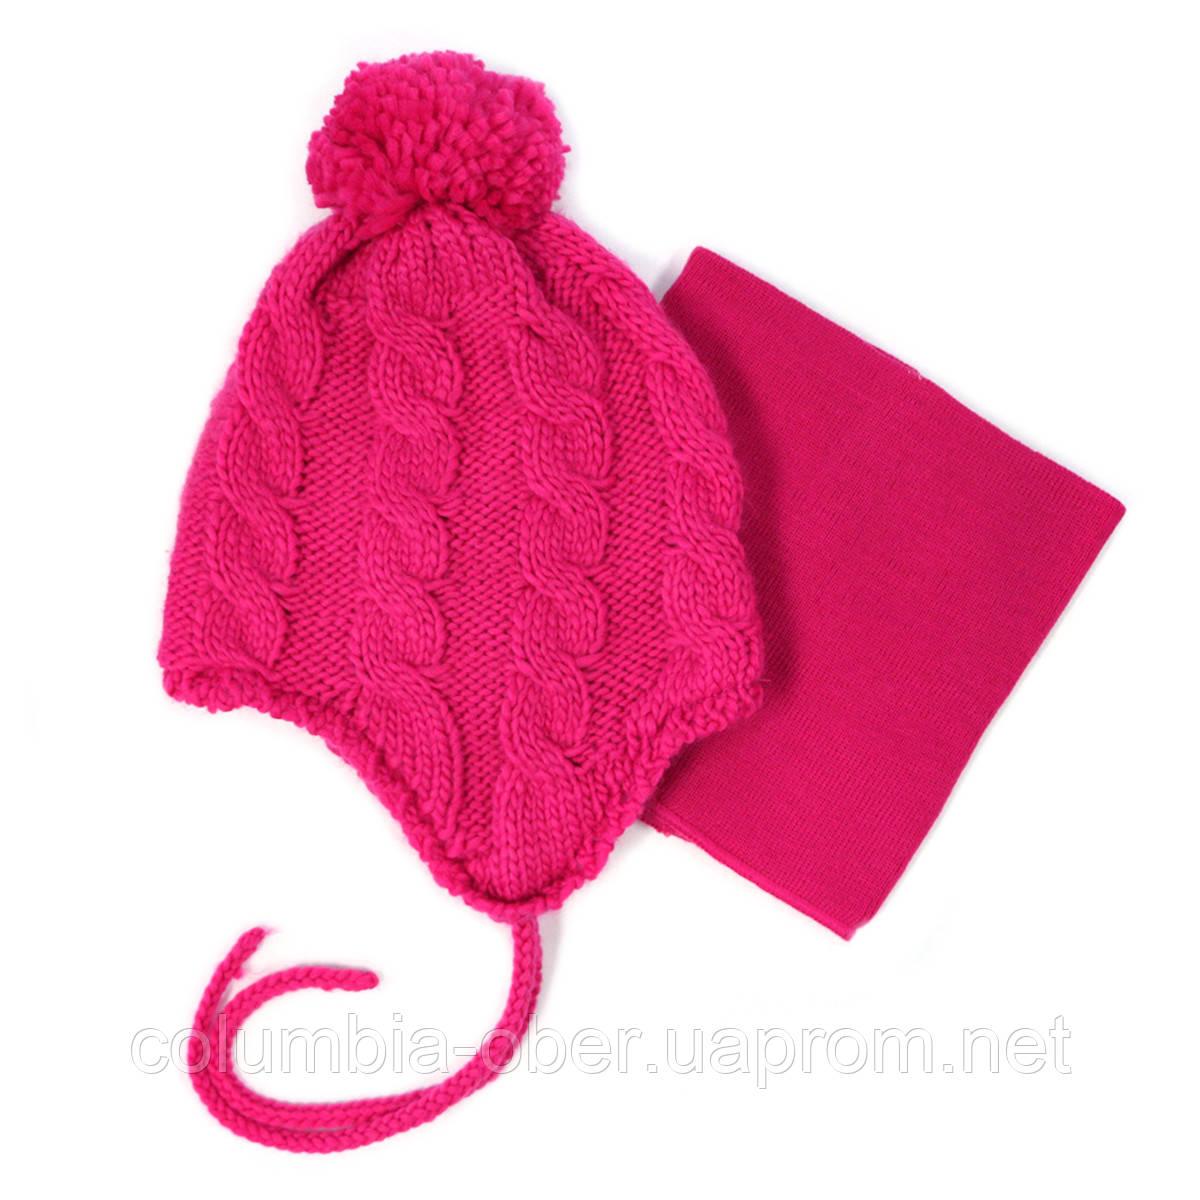 Зимняя шапка+манишка для девочки PELUCHE 52 EF ACC F16 Hot Pink. Размер 3/5 и 6/8.